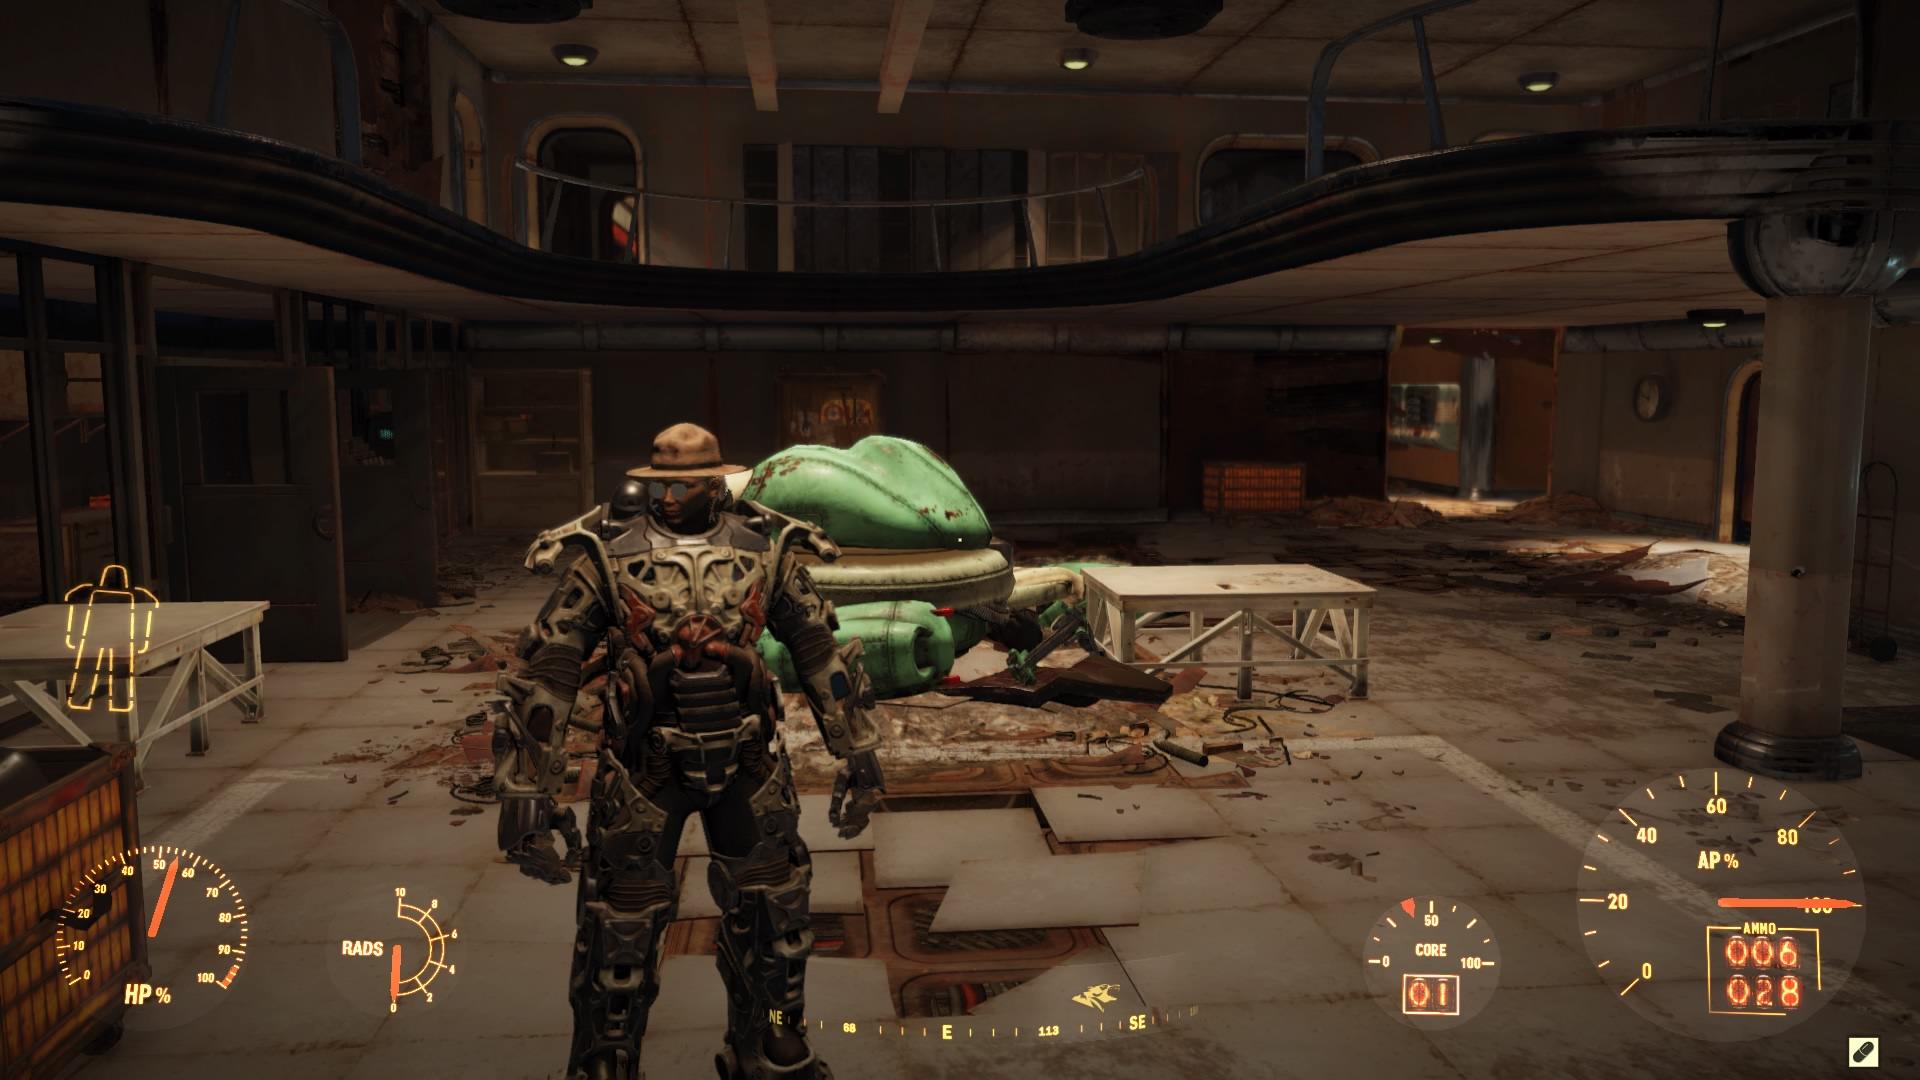 Как быстро найти силовую броню в Fallout 76 - Shazoo